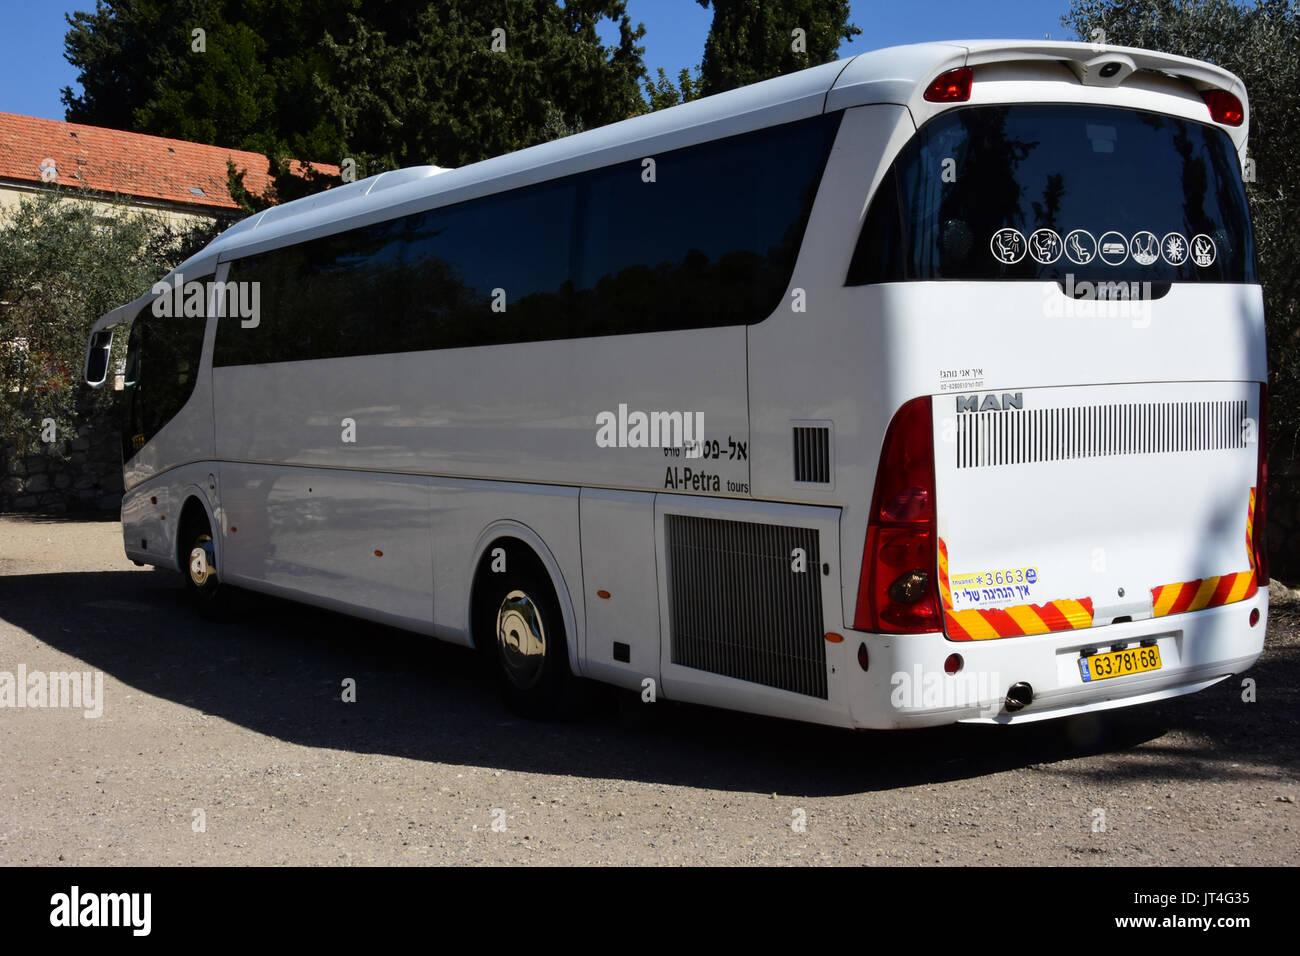 fab9760878 public coach in israel Stock Photo  152535129 - Alamy